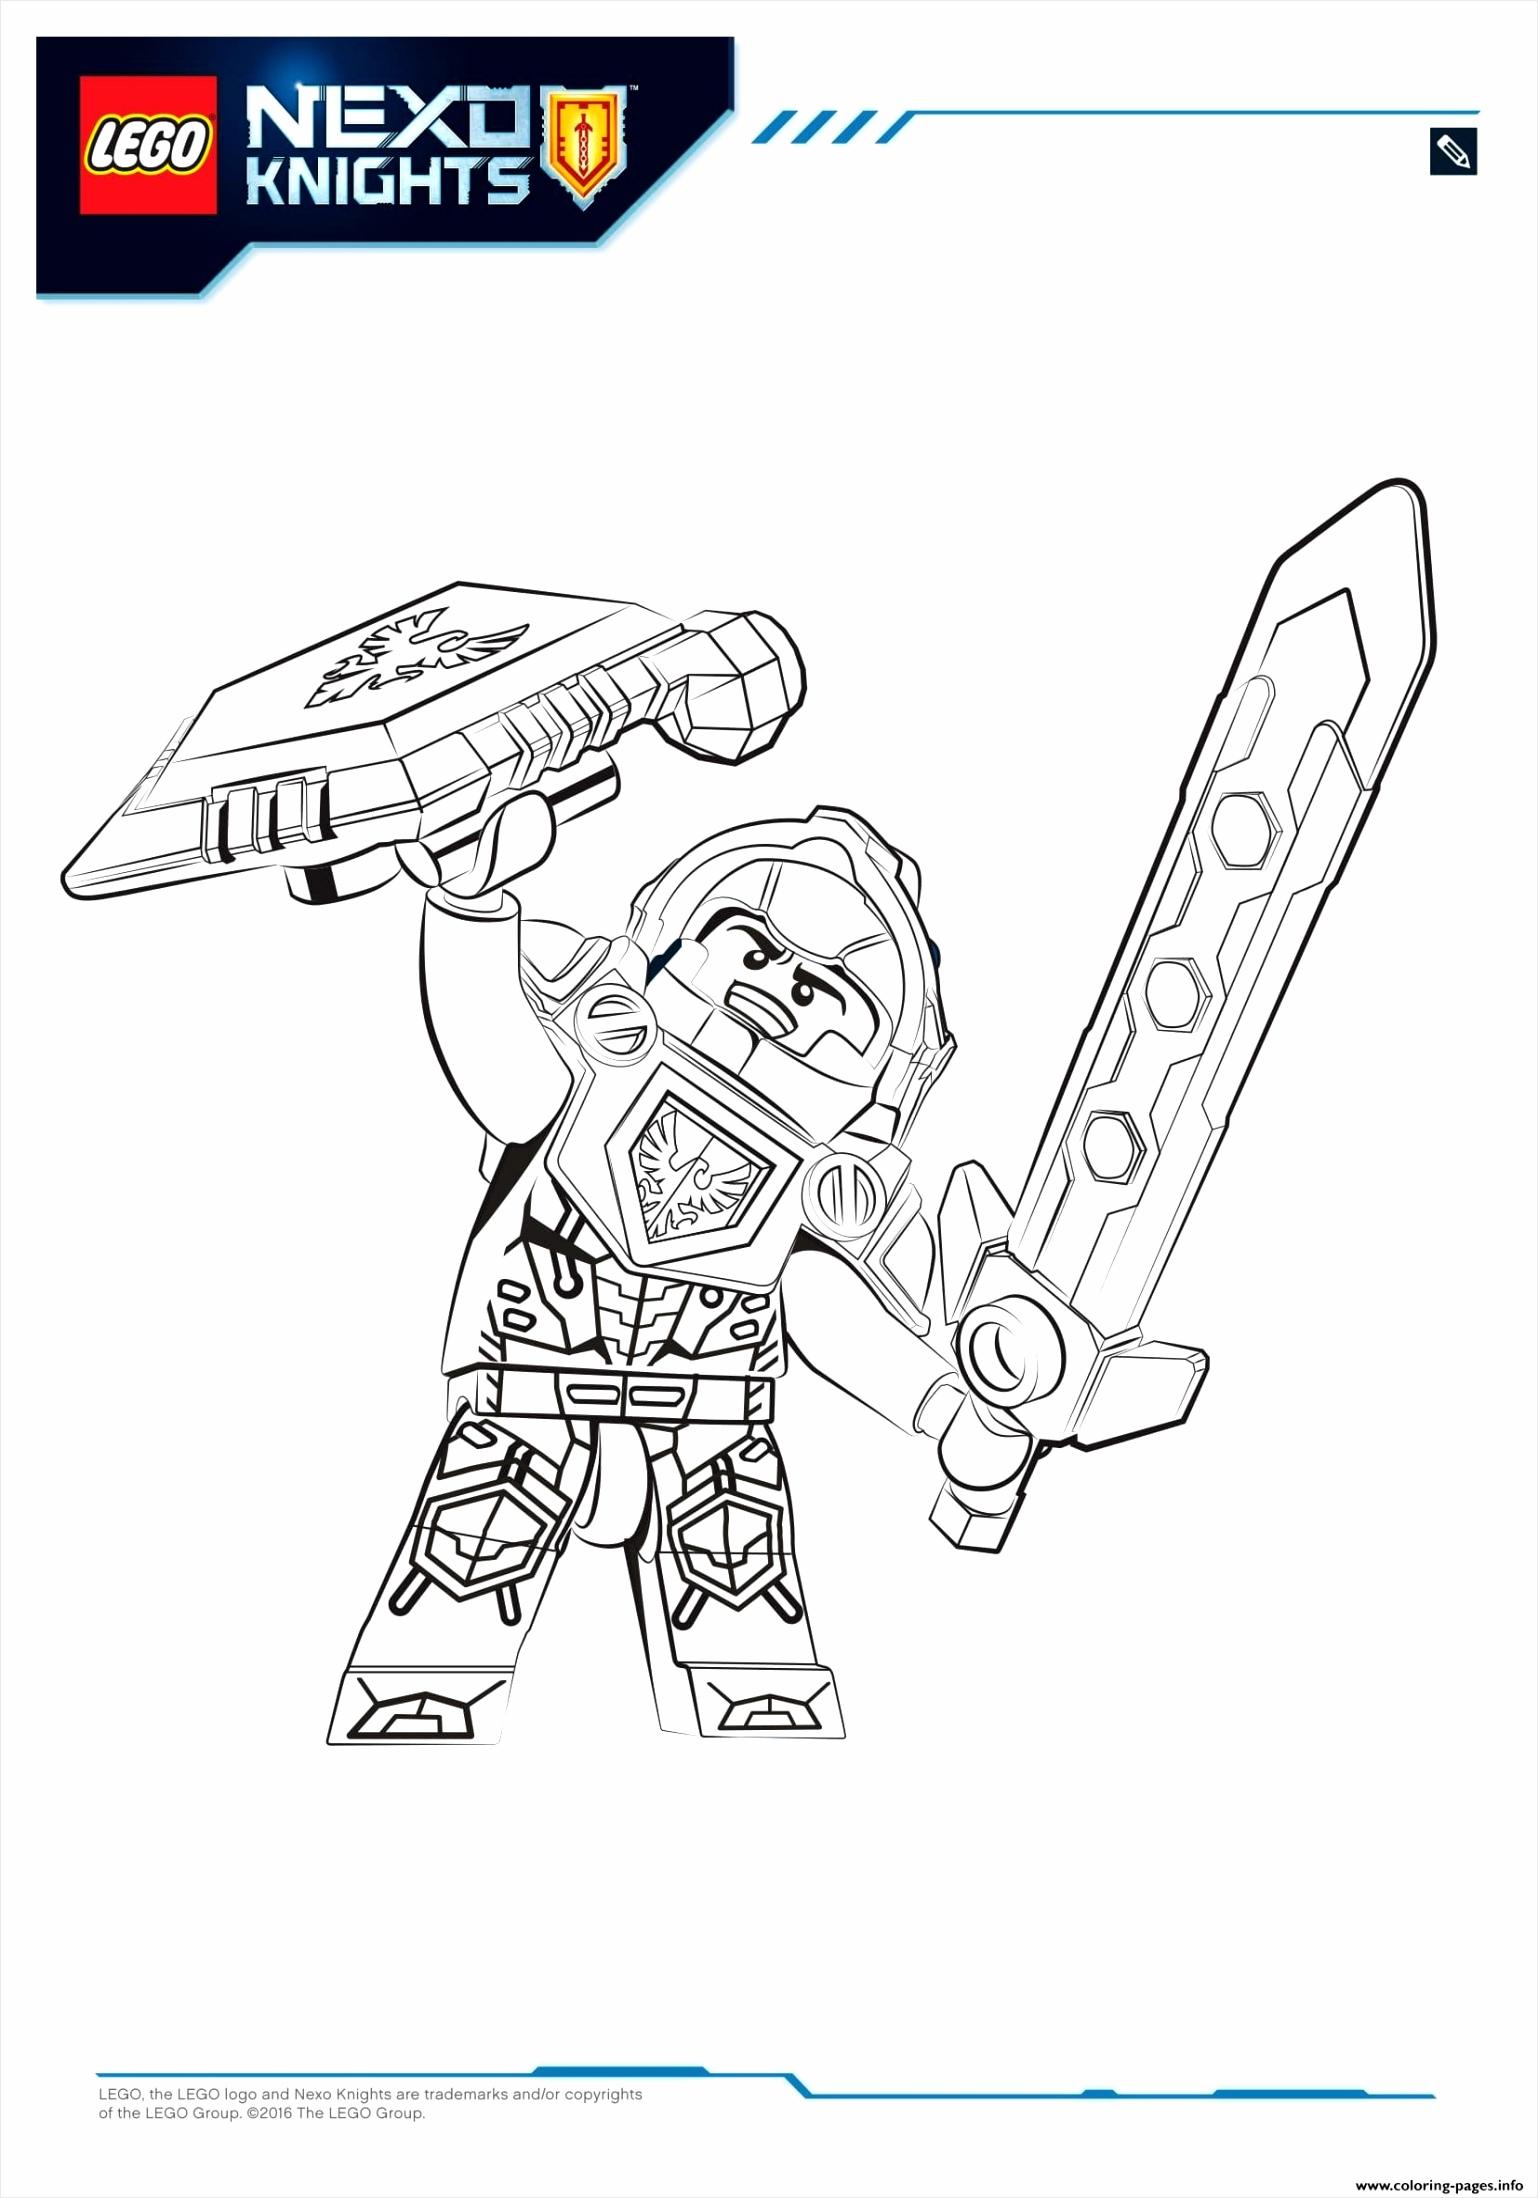 best website nexo knights book of monsters tumblr lego clay lego ninjago movie coloring sheets onlinen spongebob uiwar